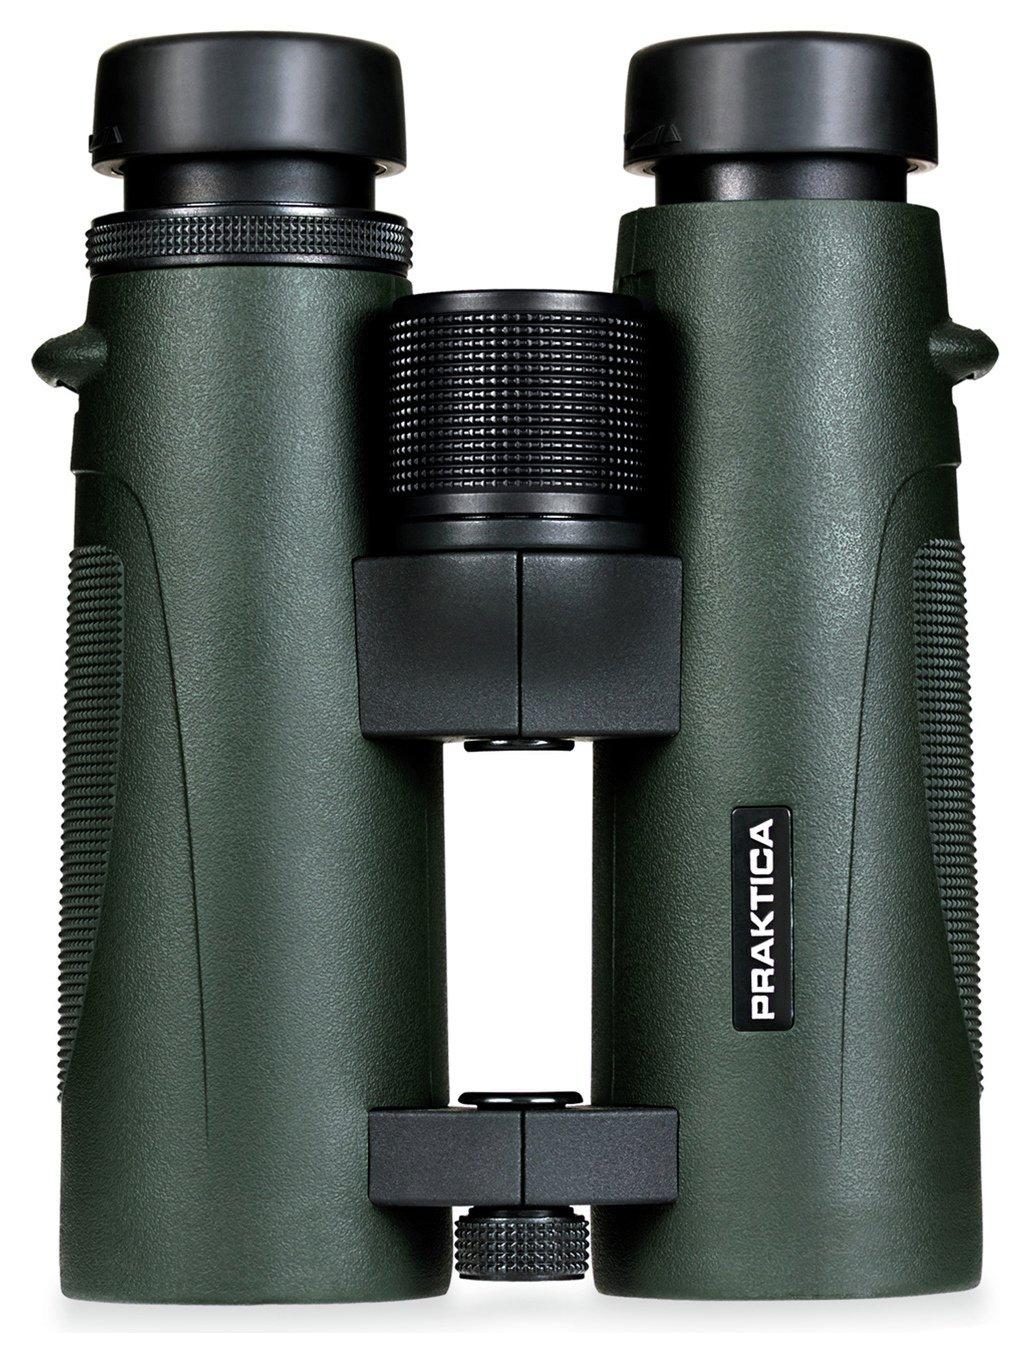 Praktica - Binoculars - Ambassador 10x42mm Waterproof